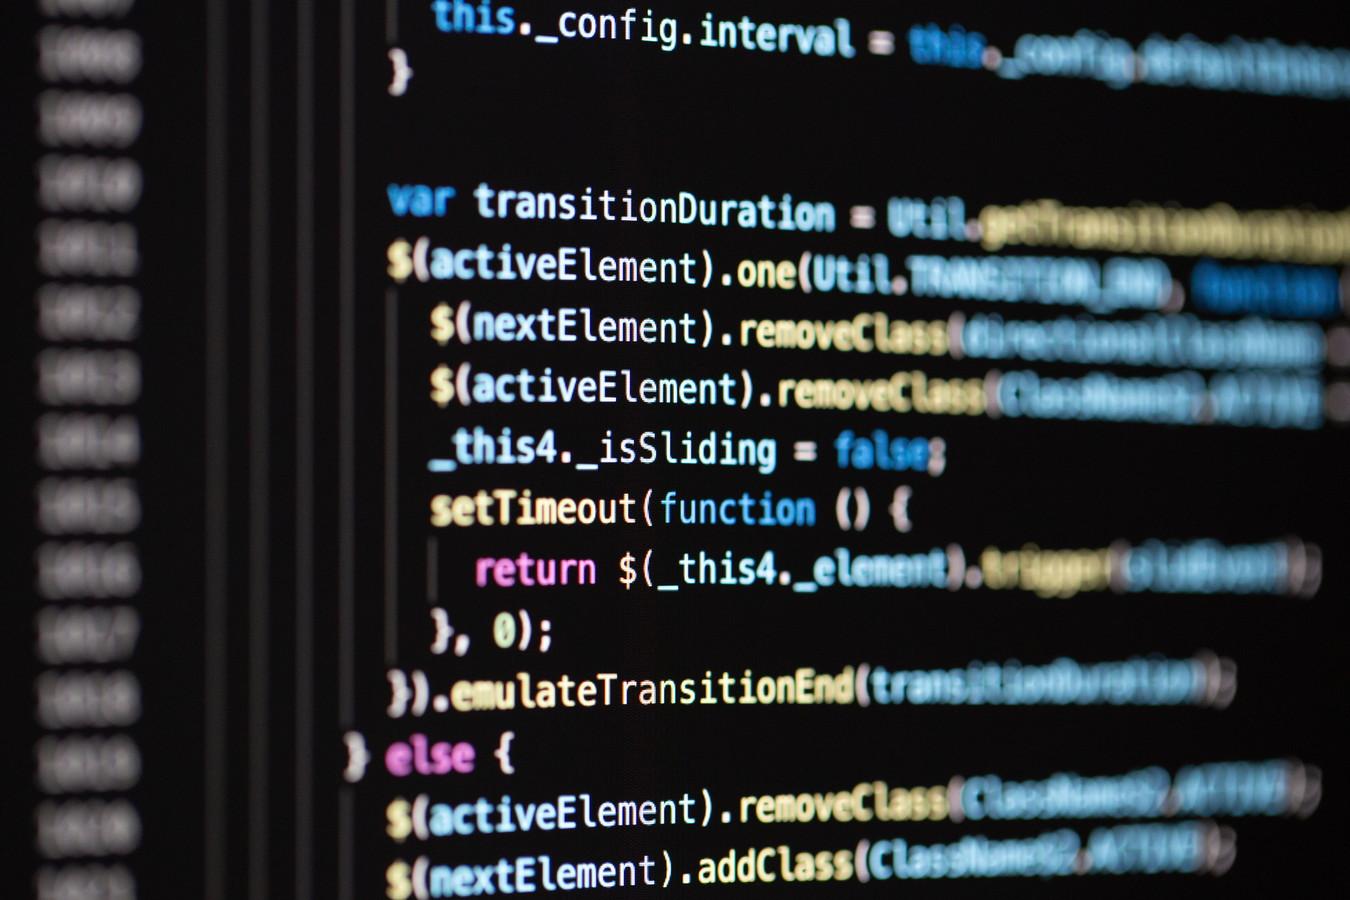 【PHPの型】booleanとintegerの説明と使い方